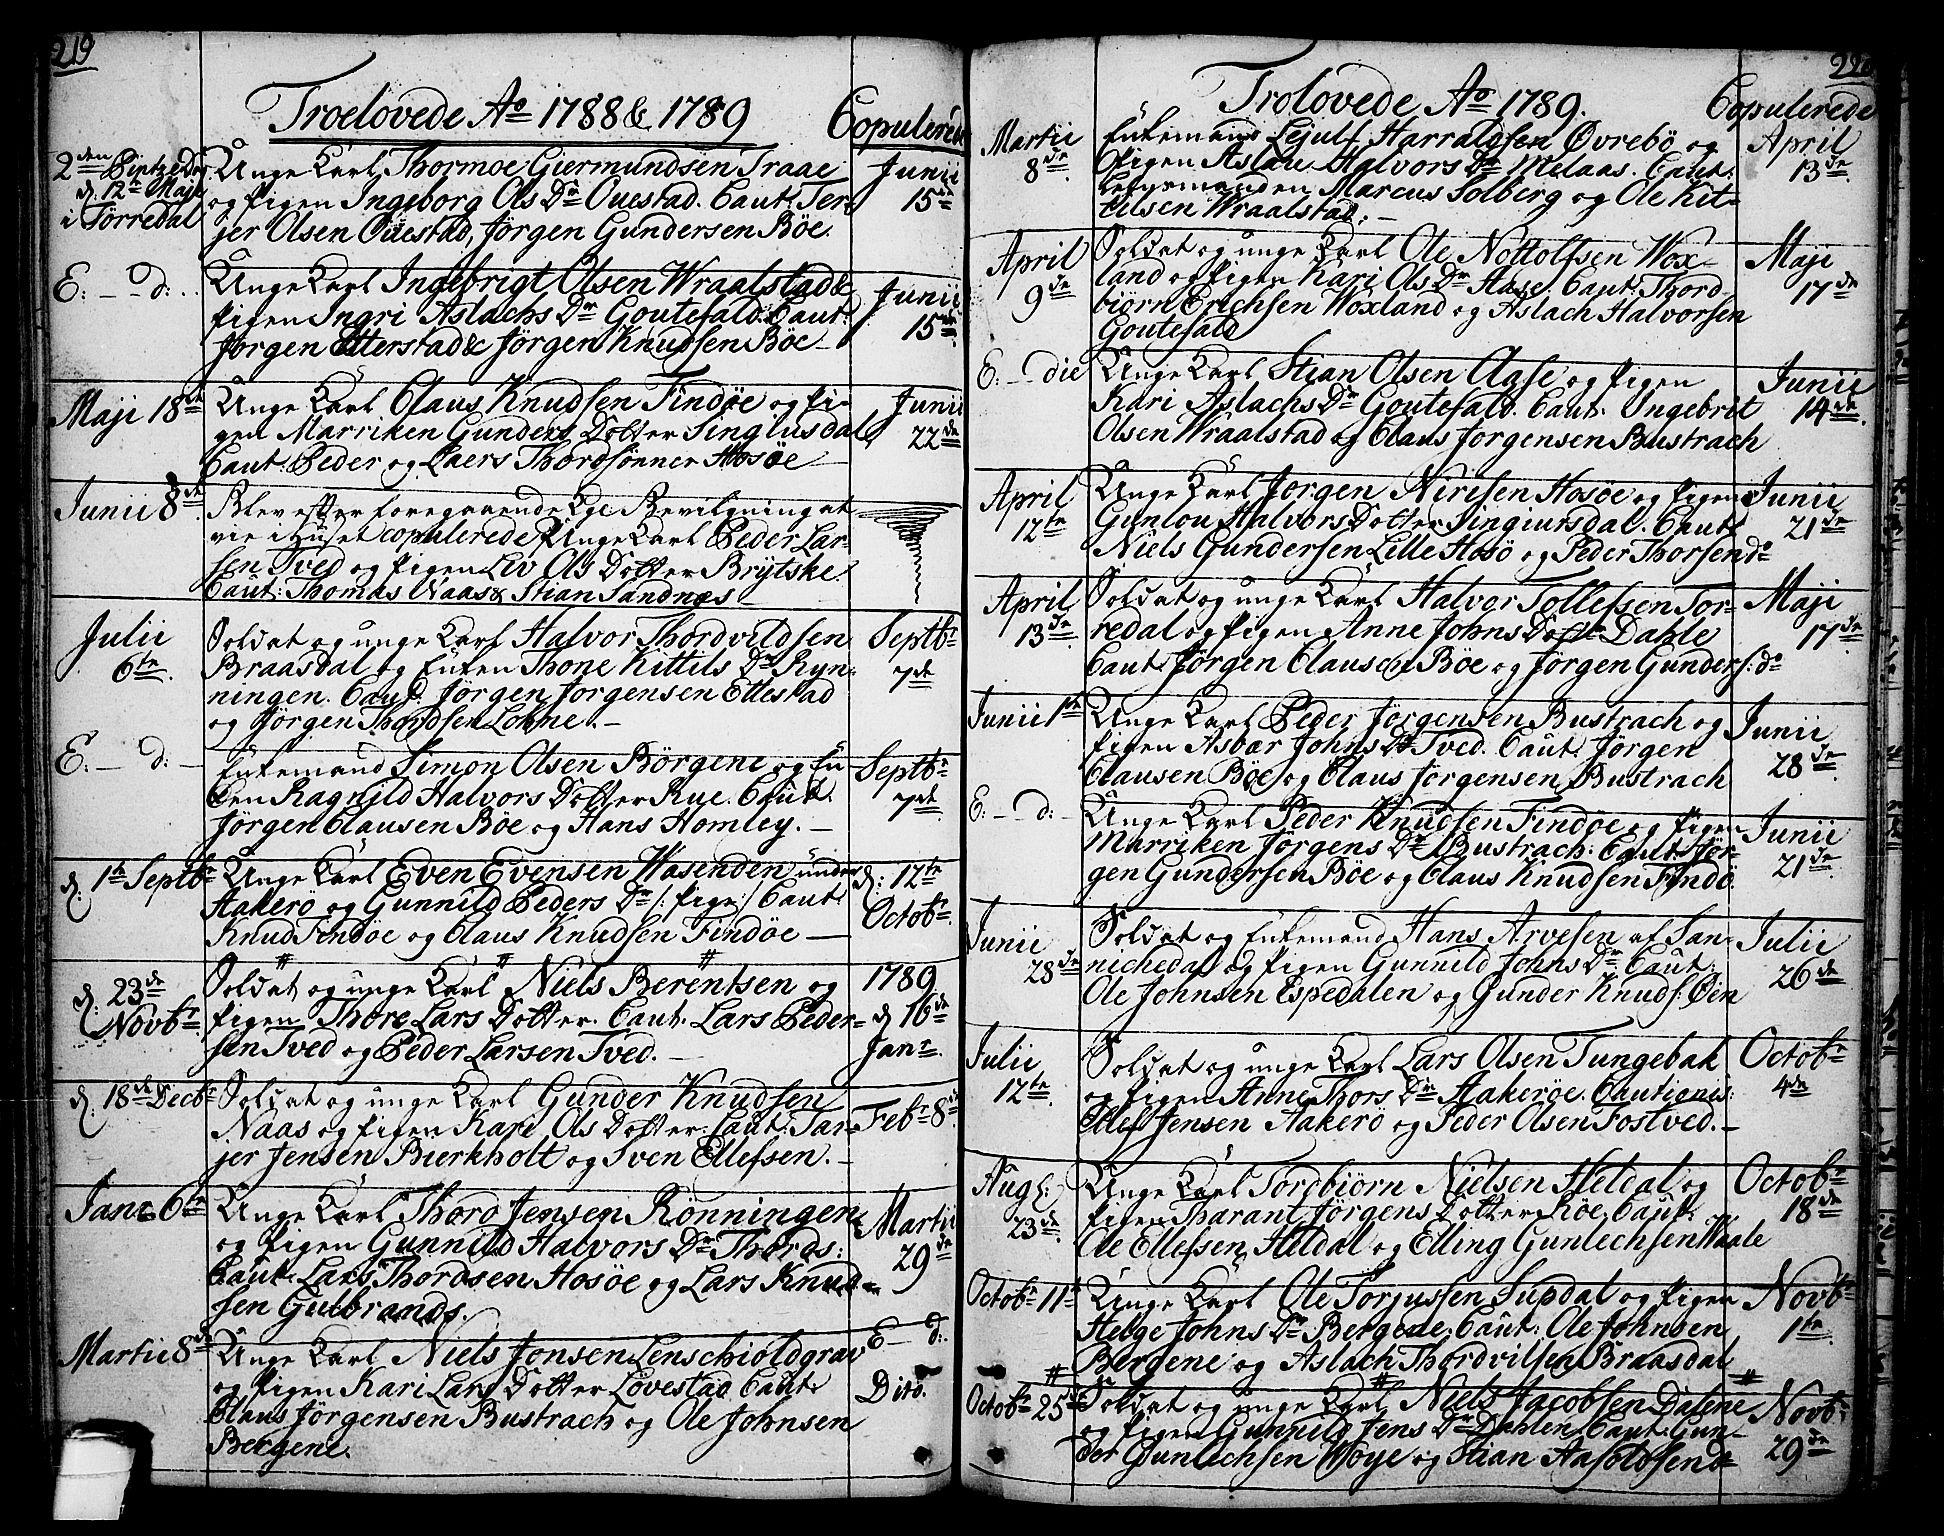 SAKO, Drangedal kirkebøker, F/Fa/L0003: Ministerialbok nr. 3, 1768-1814, s. 219-220